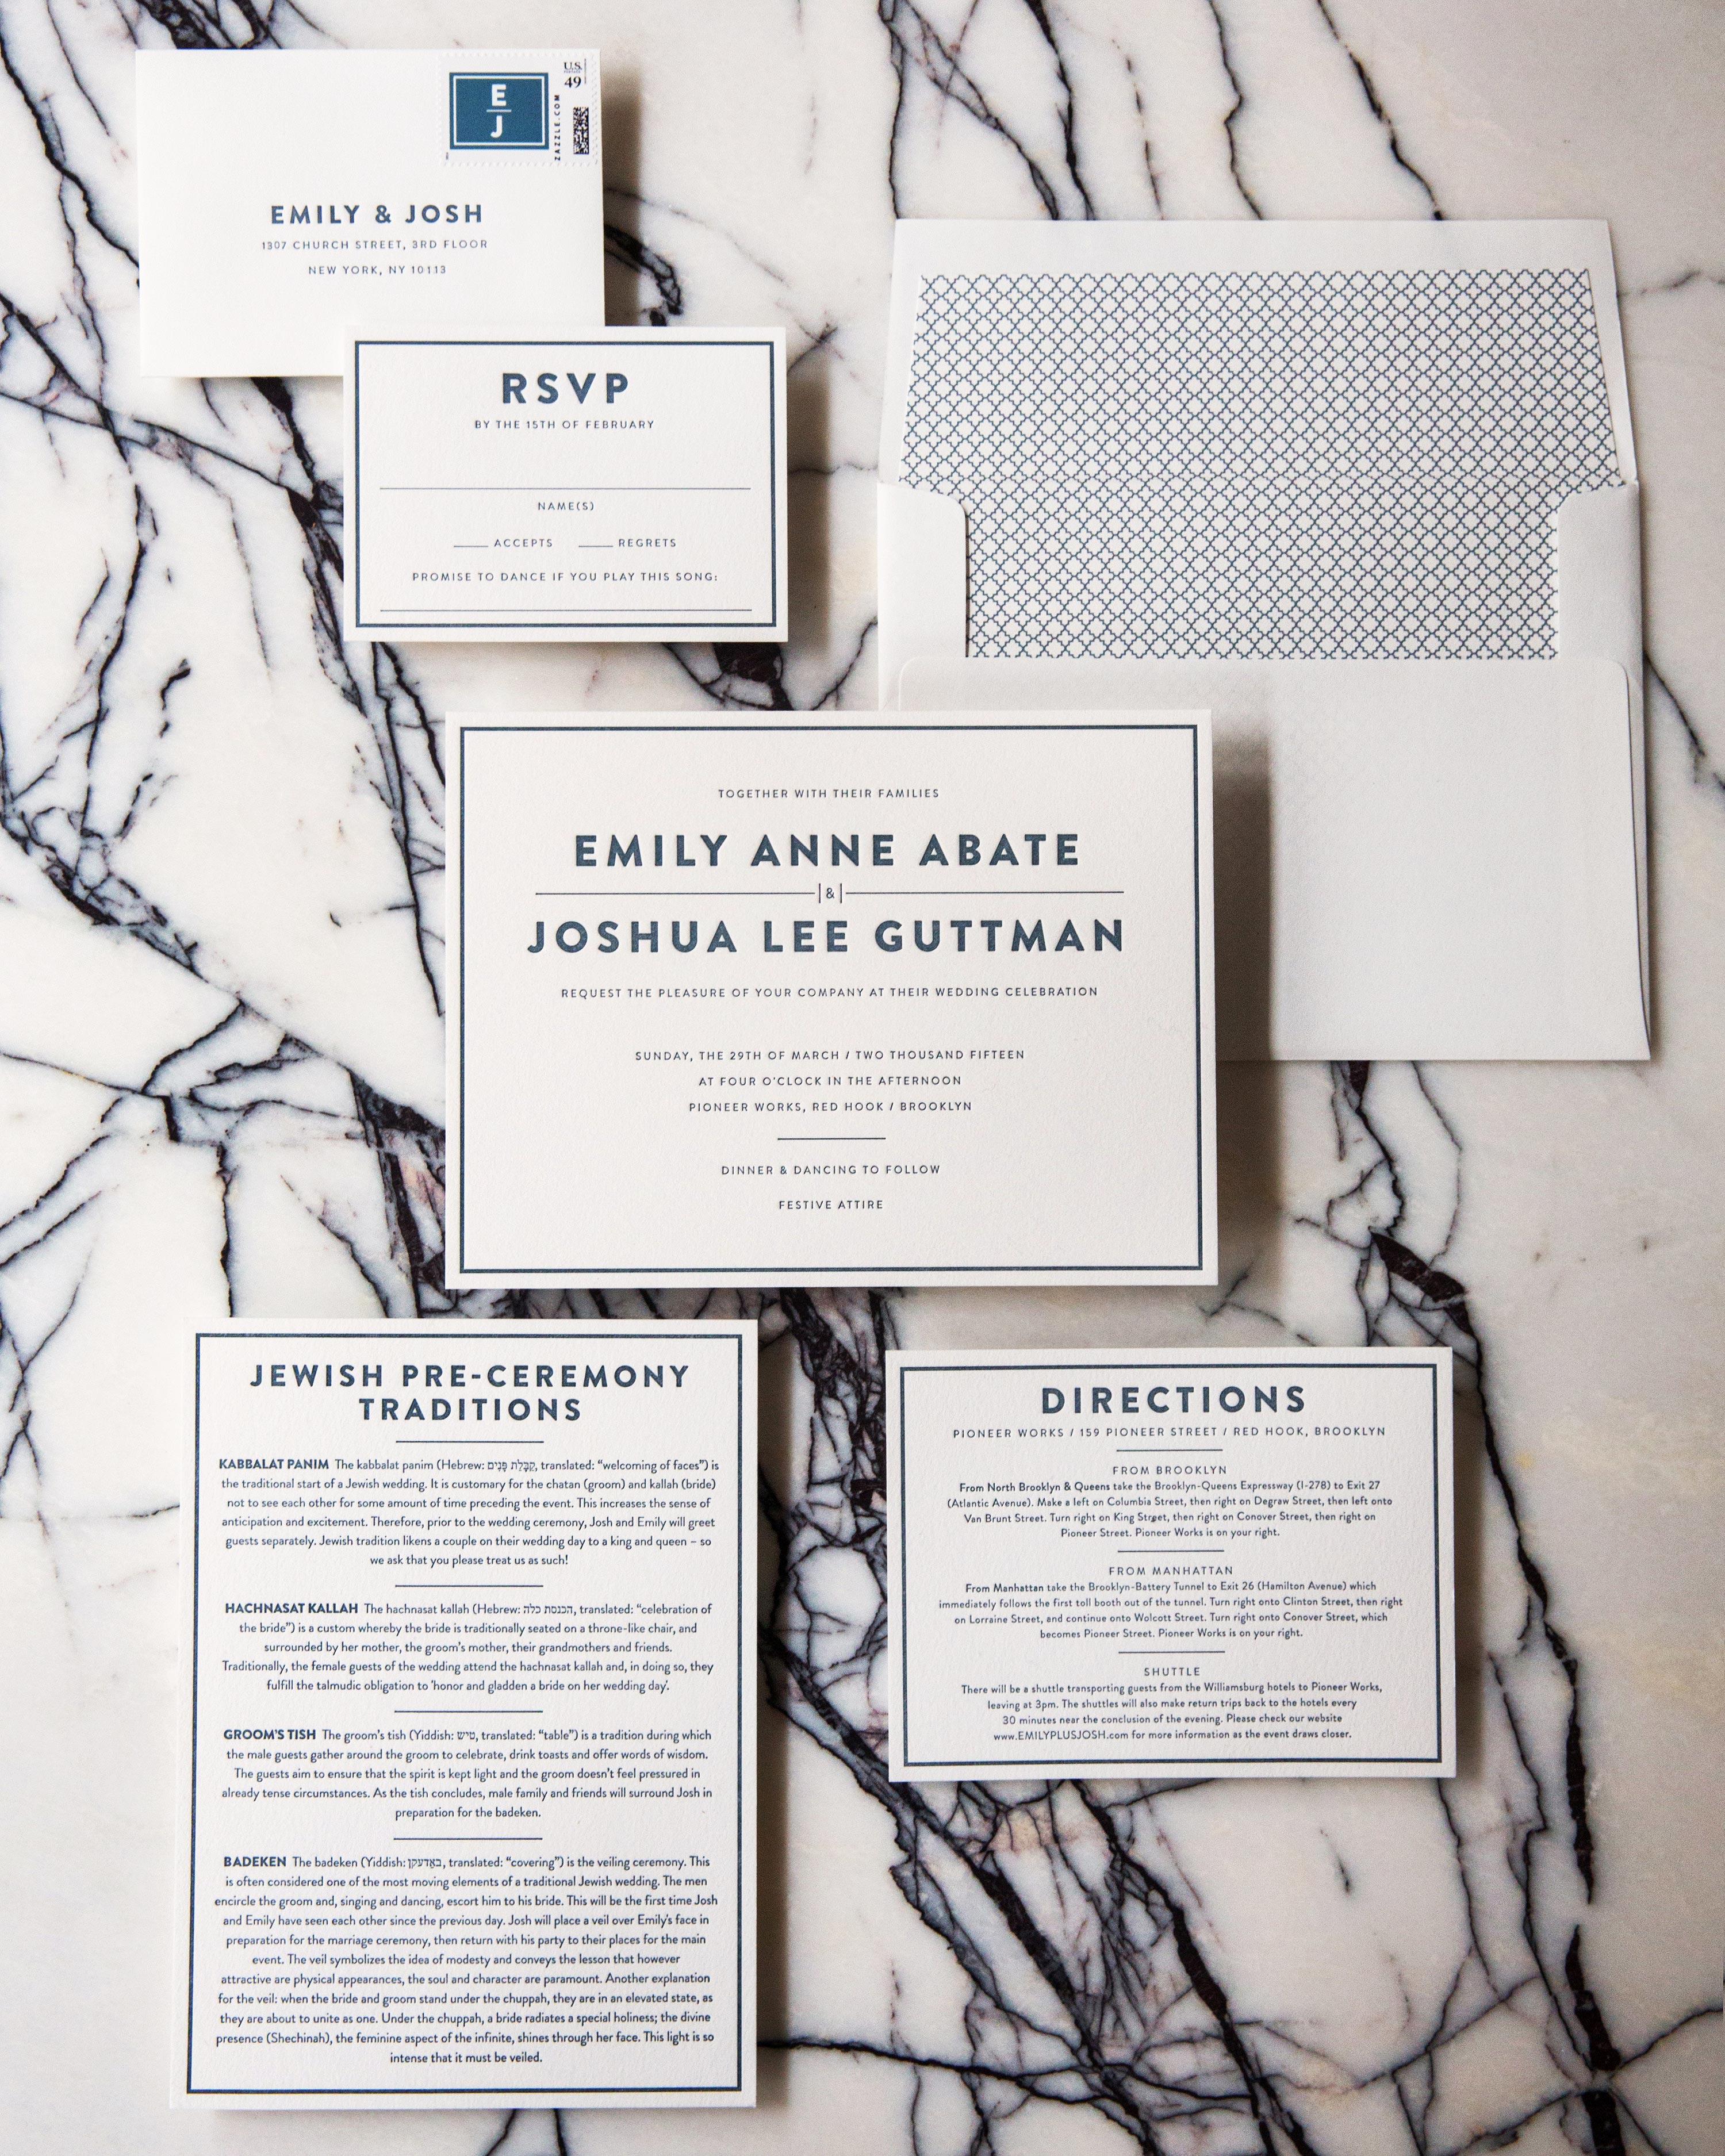 emily-josh-wedding-invitation-0005-s112719-0216.jpg